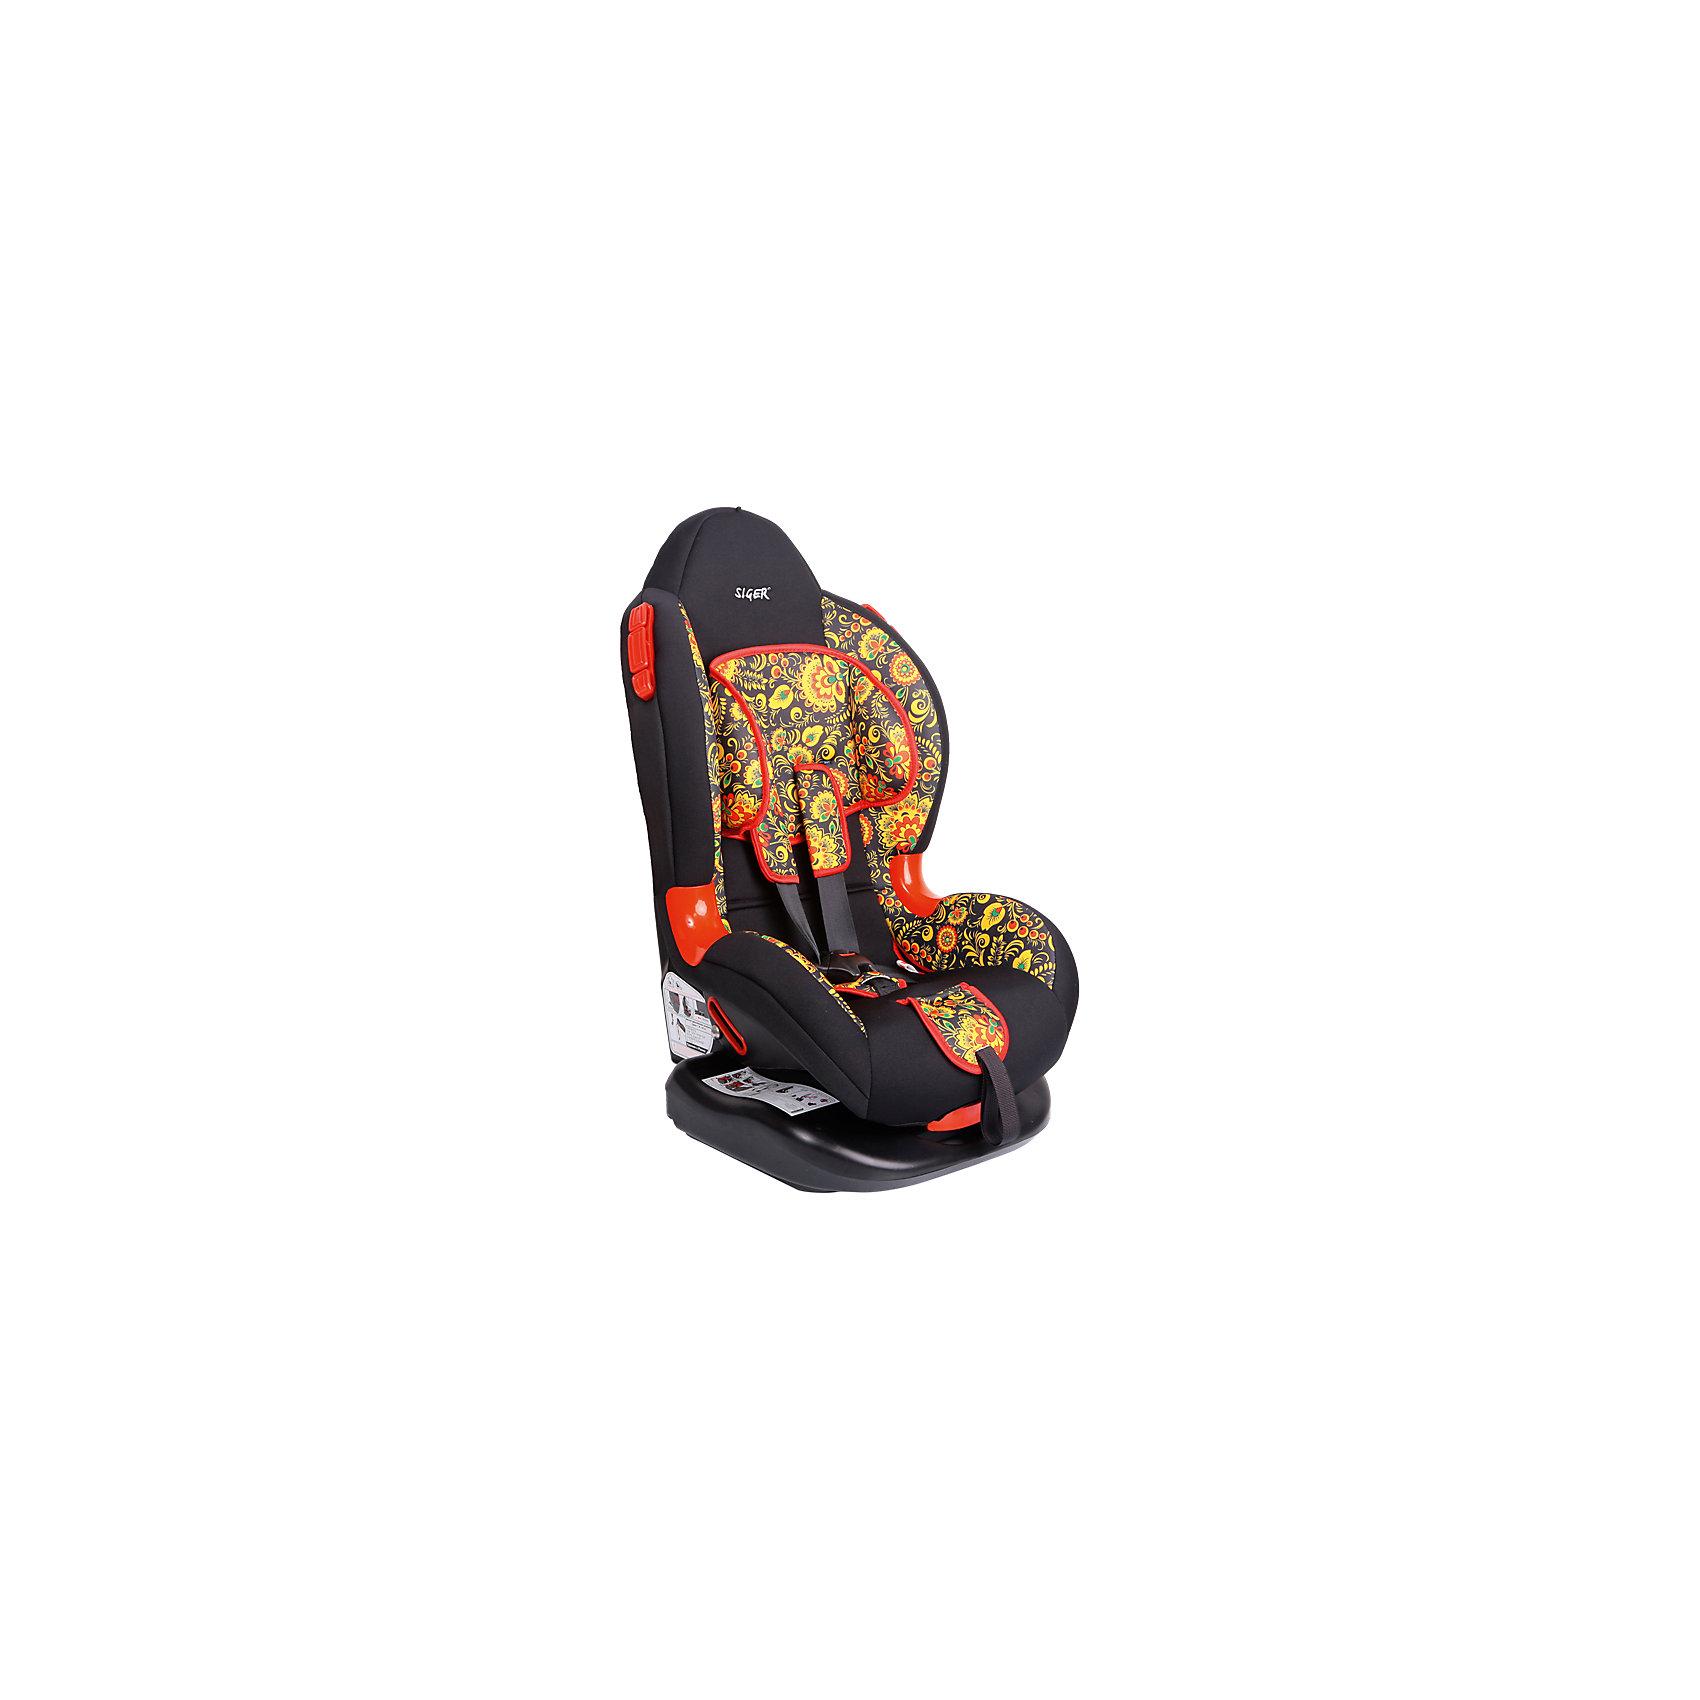 Автокресло Siger Кокон Art, 9-25 кг, хохлома